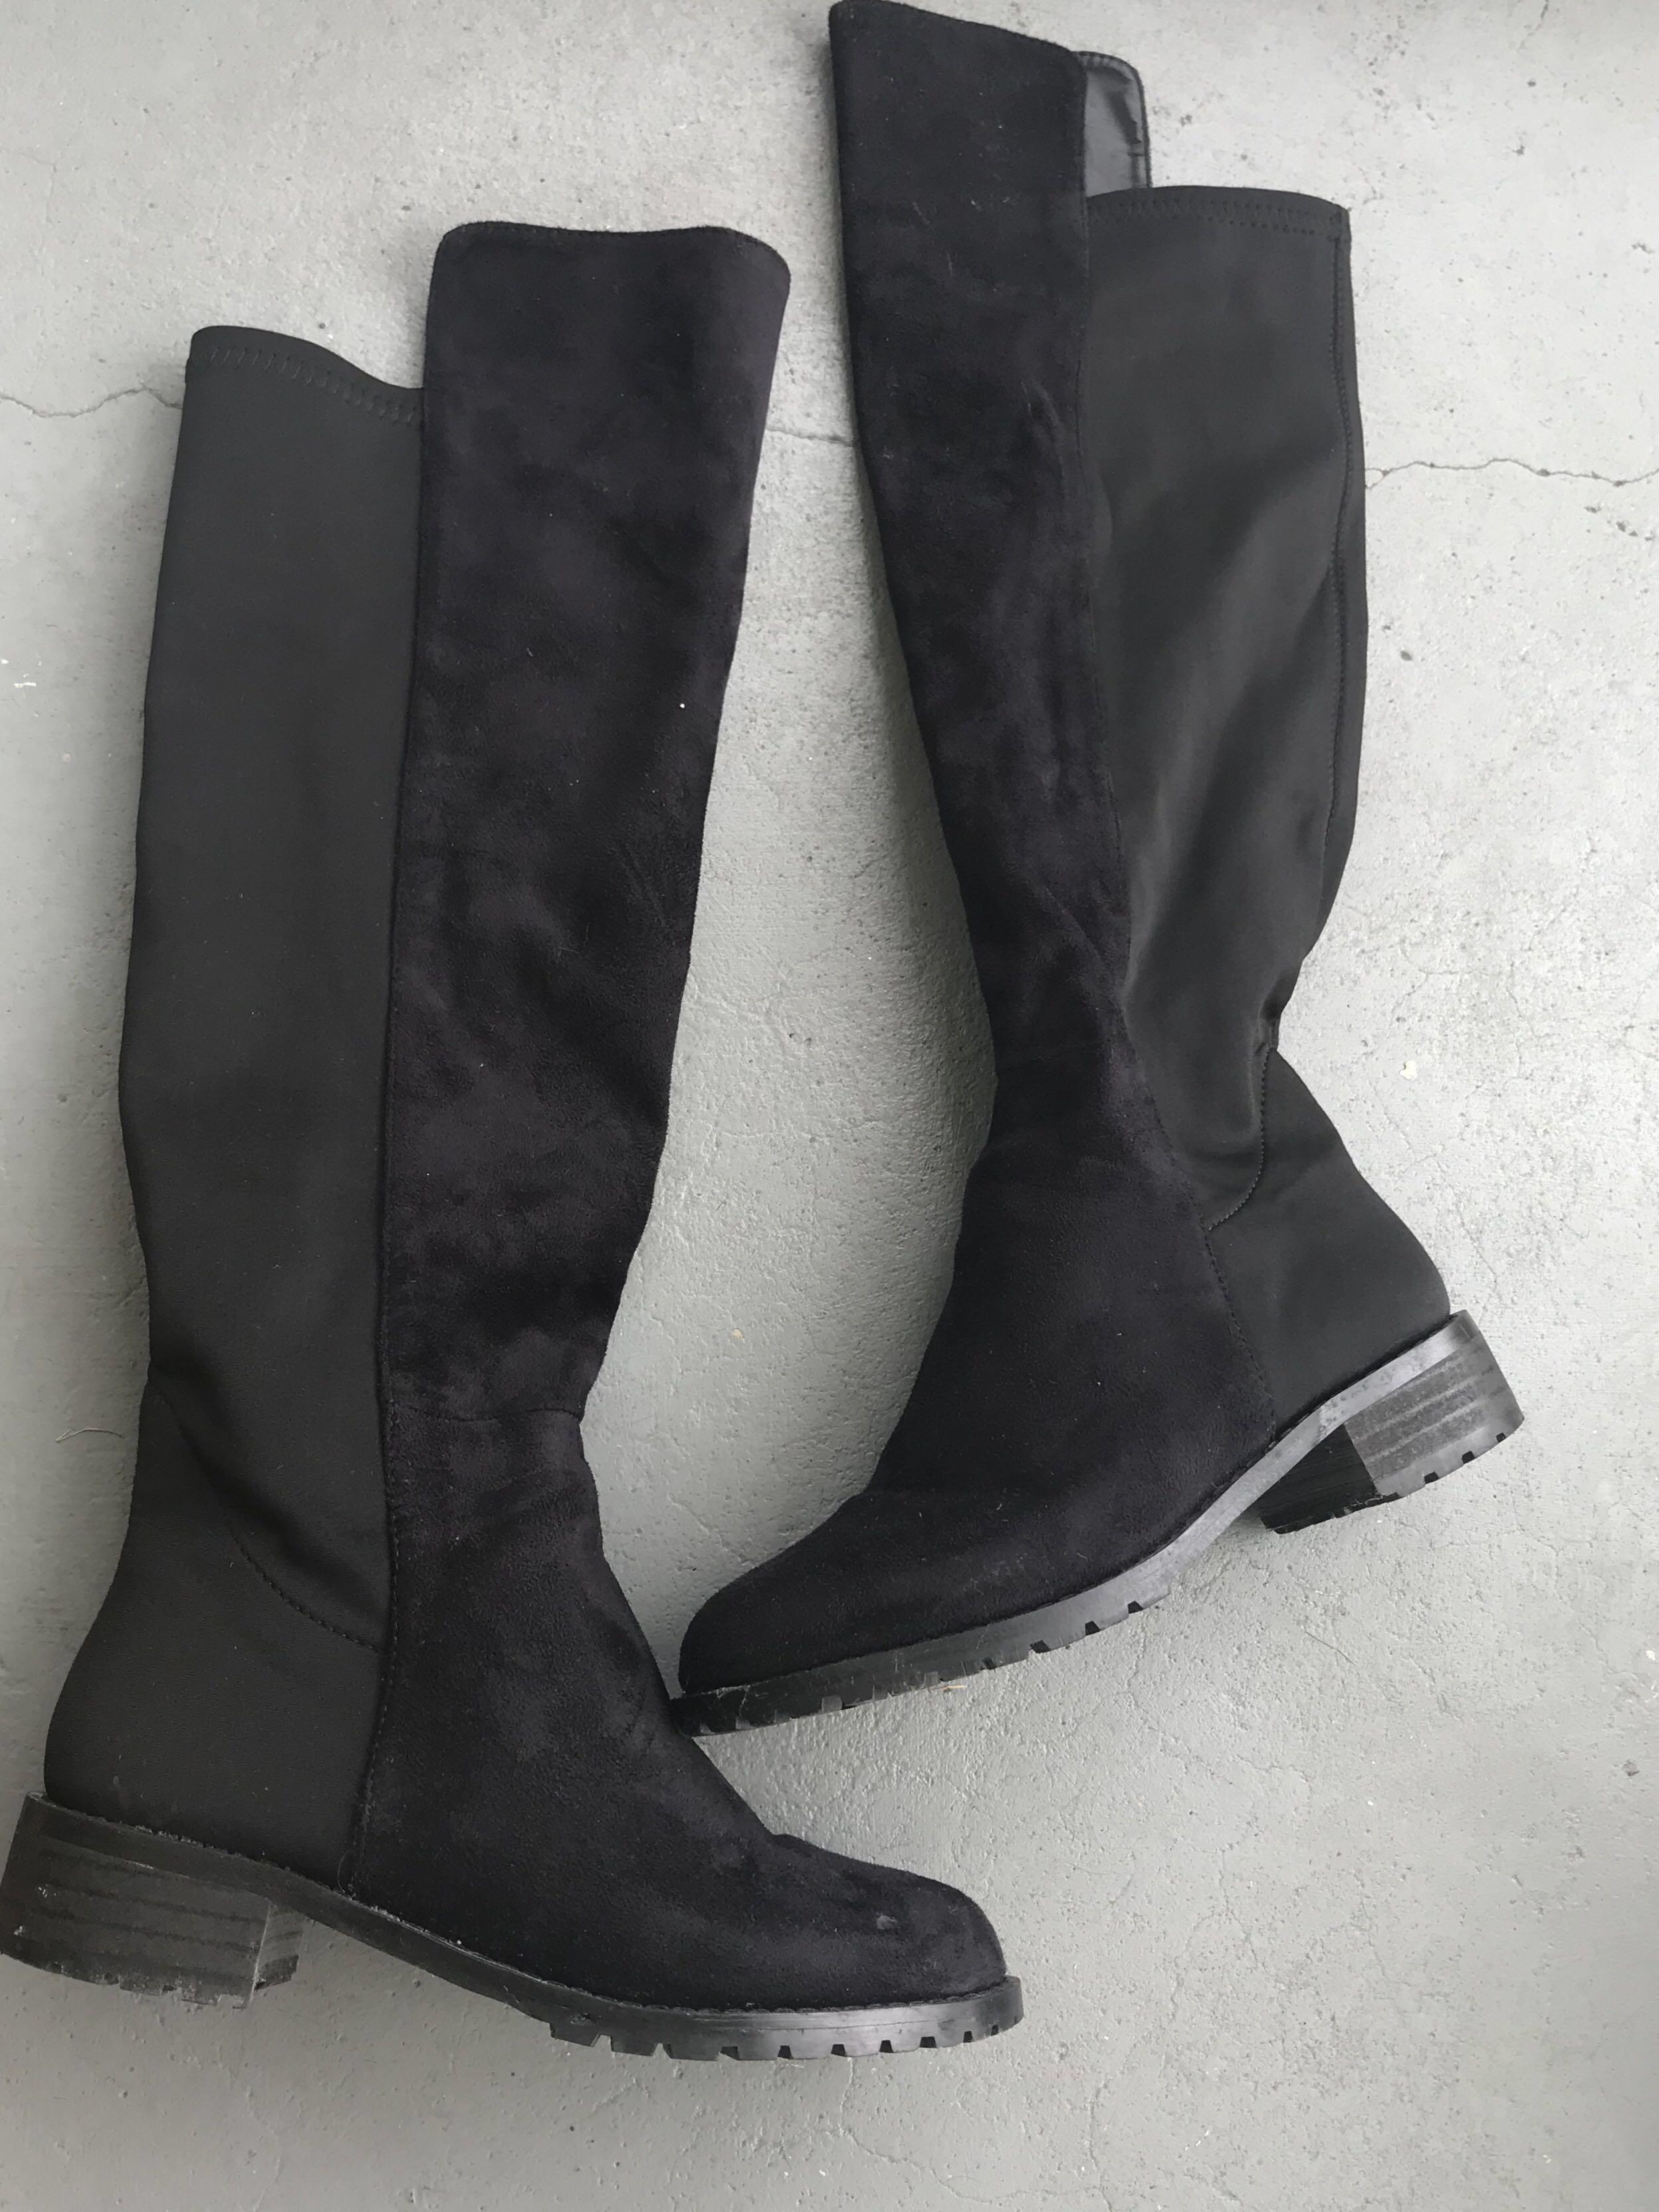 Knee high elegant black boots